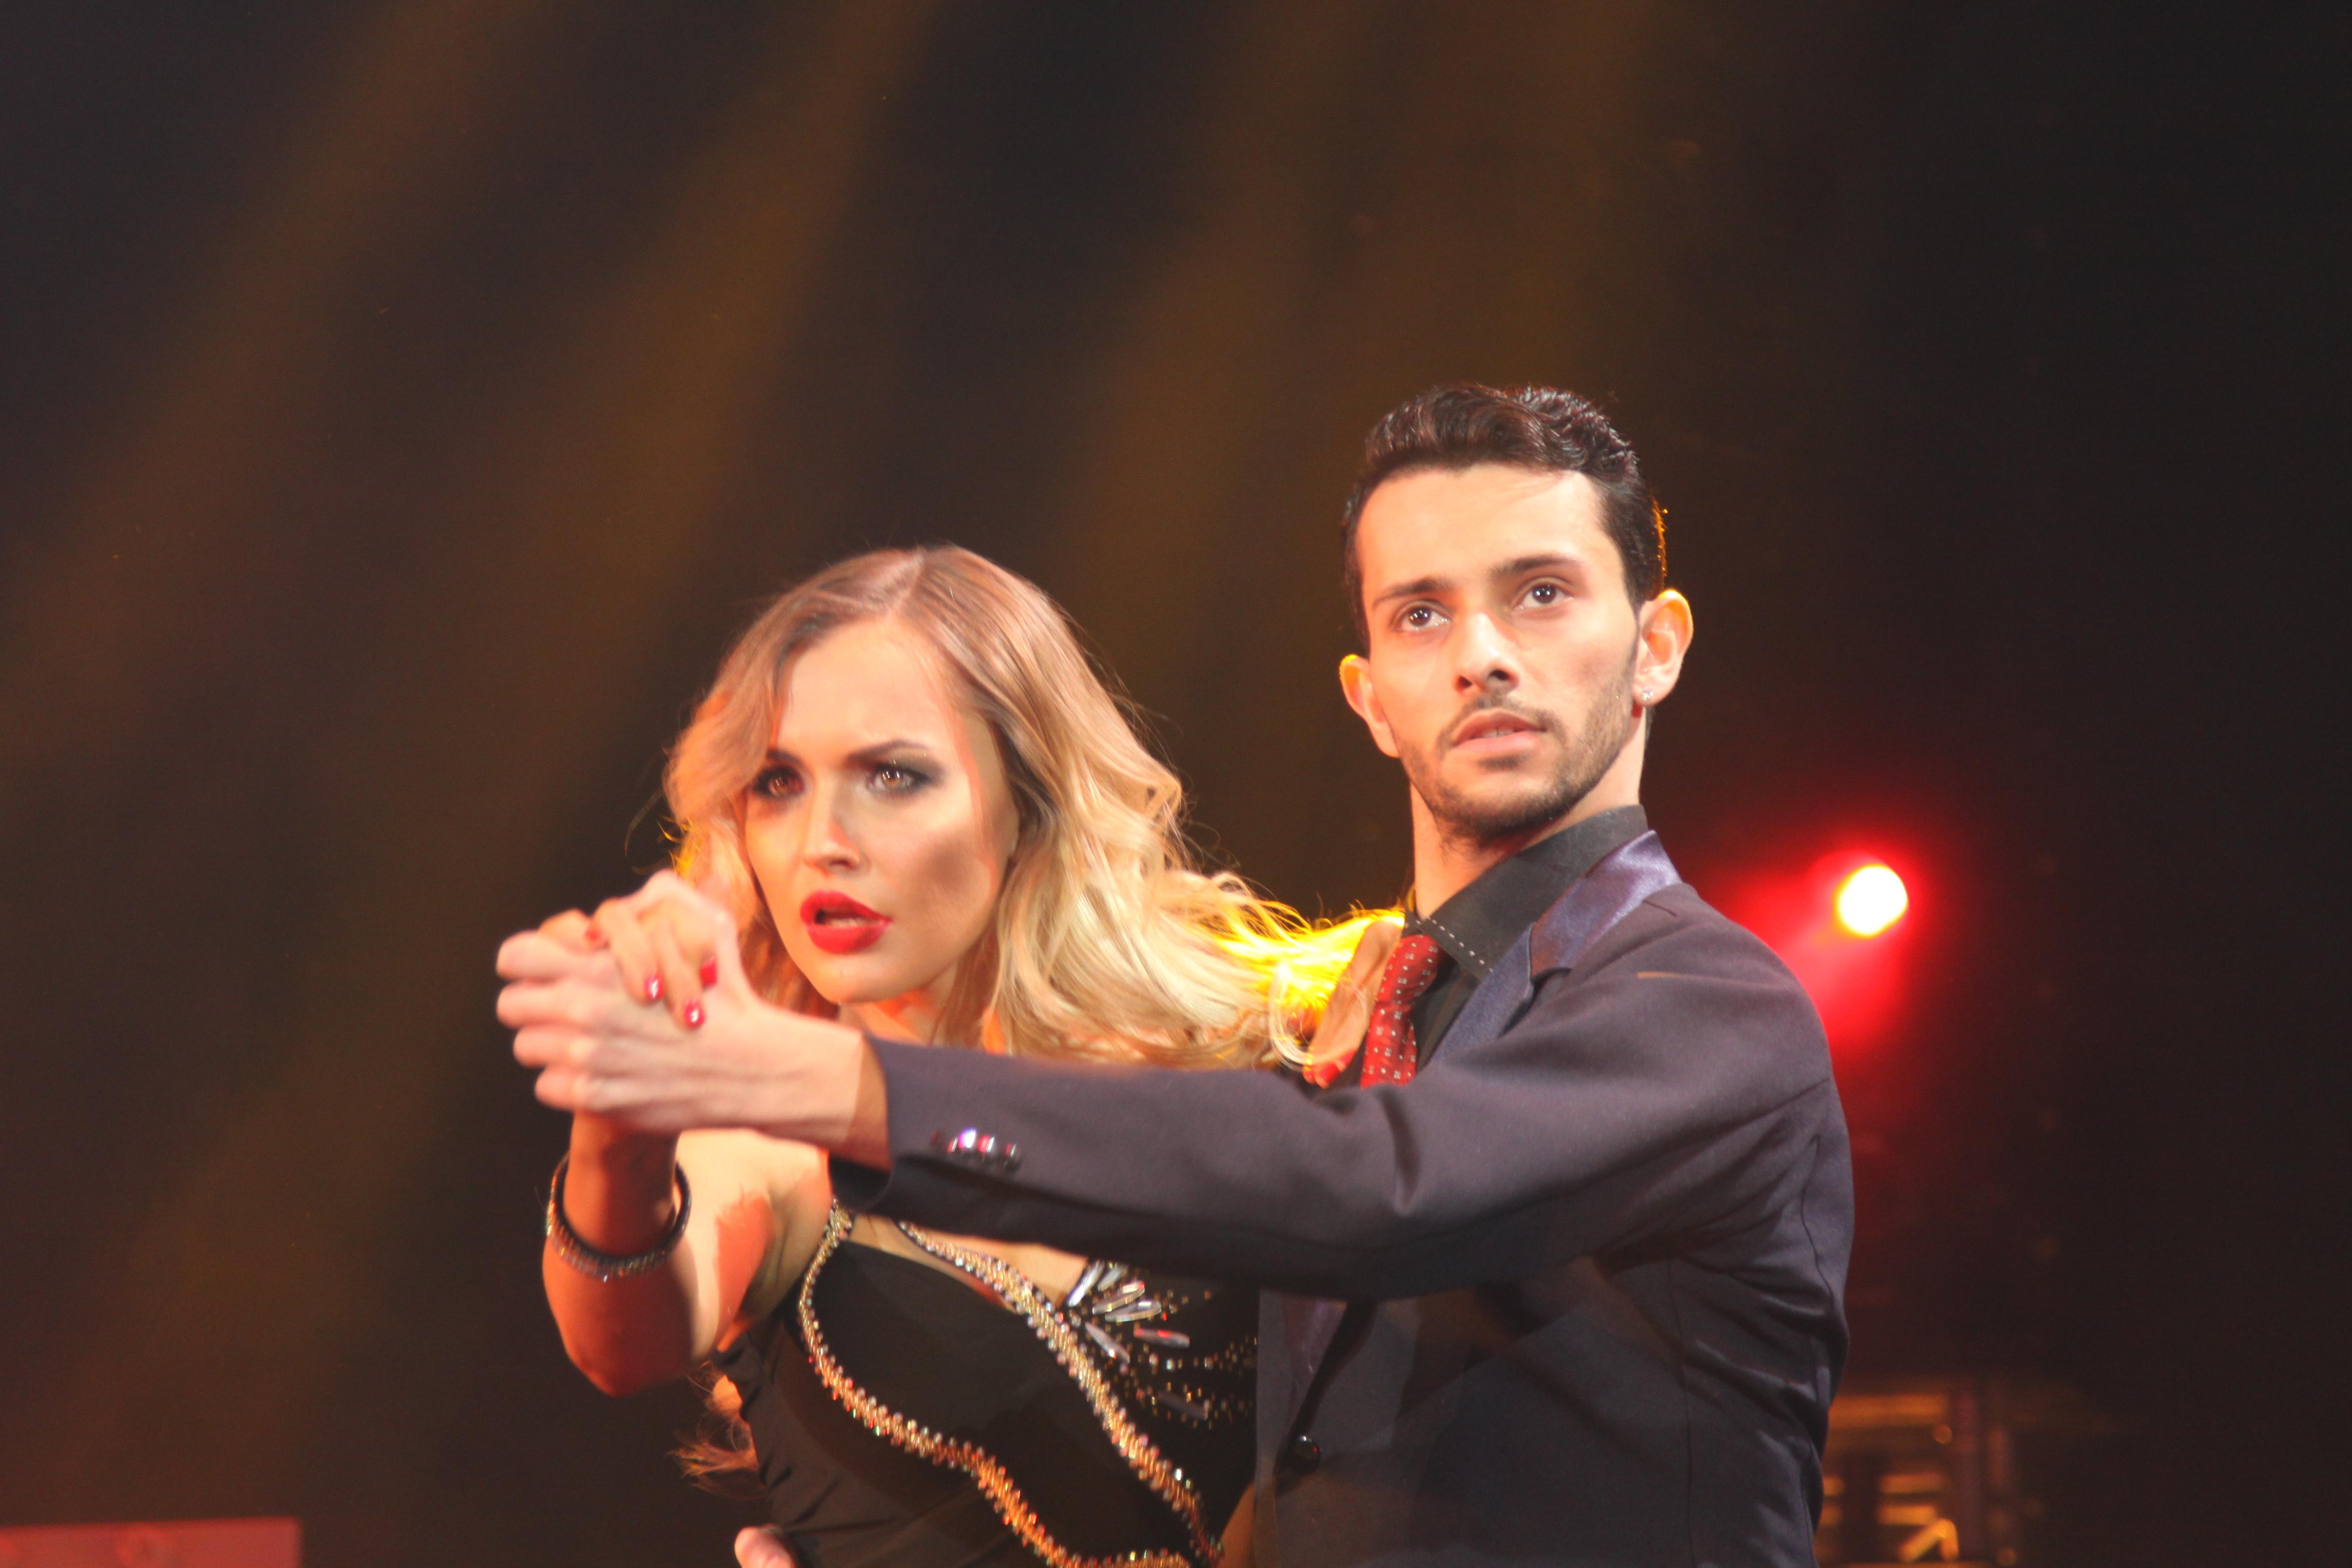 Anna Gorodgaya and partner